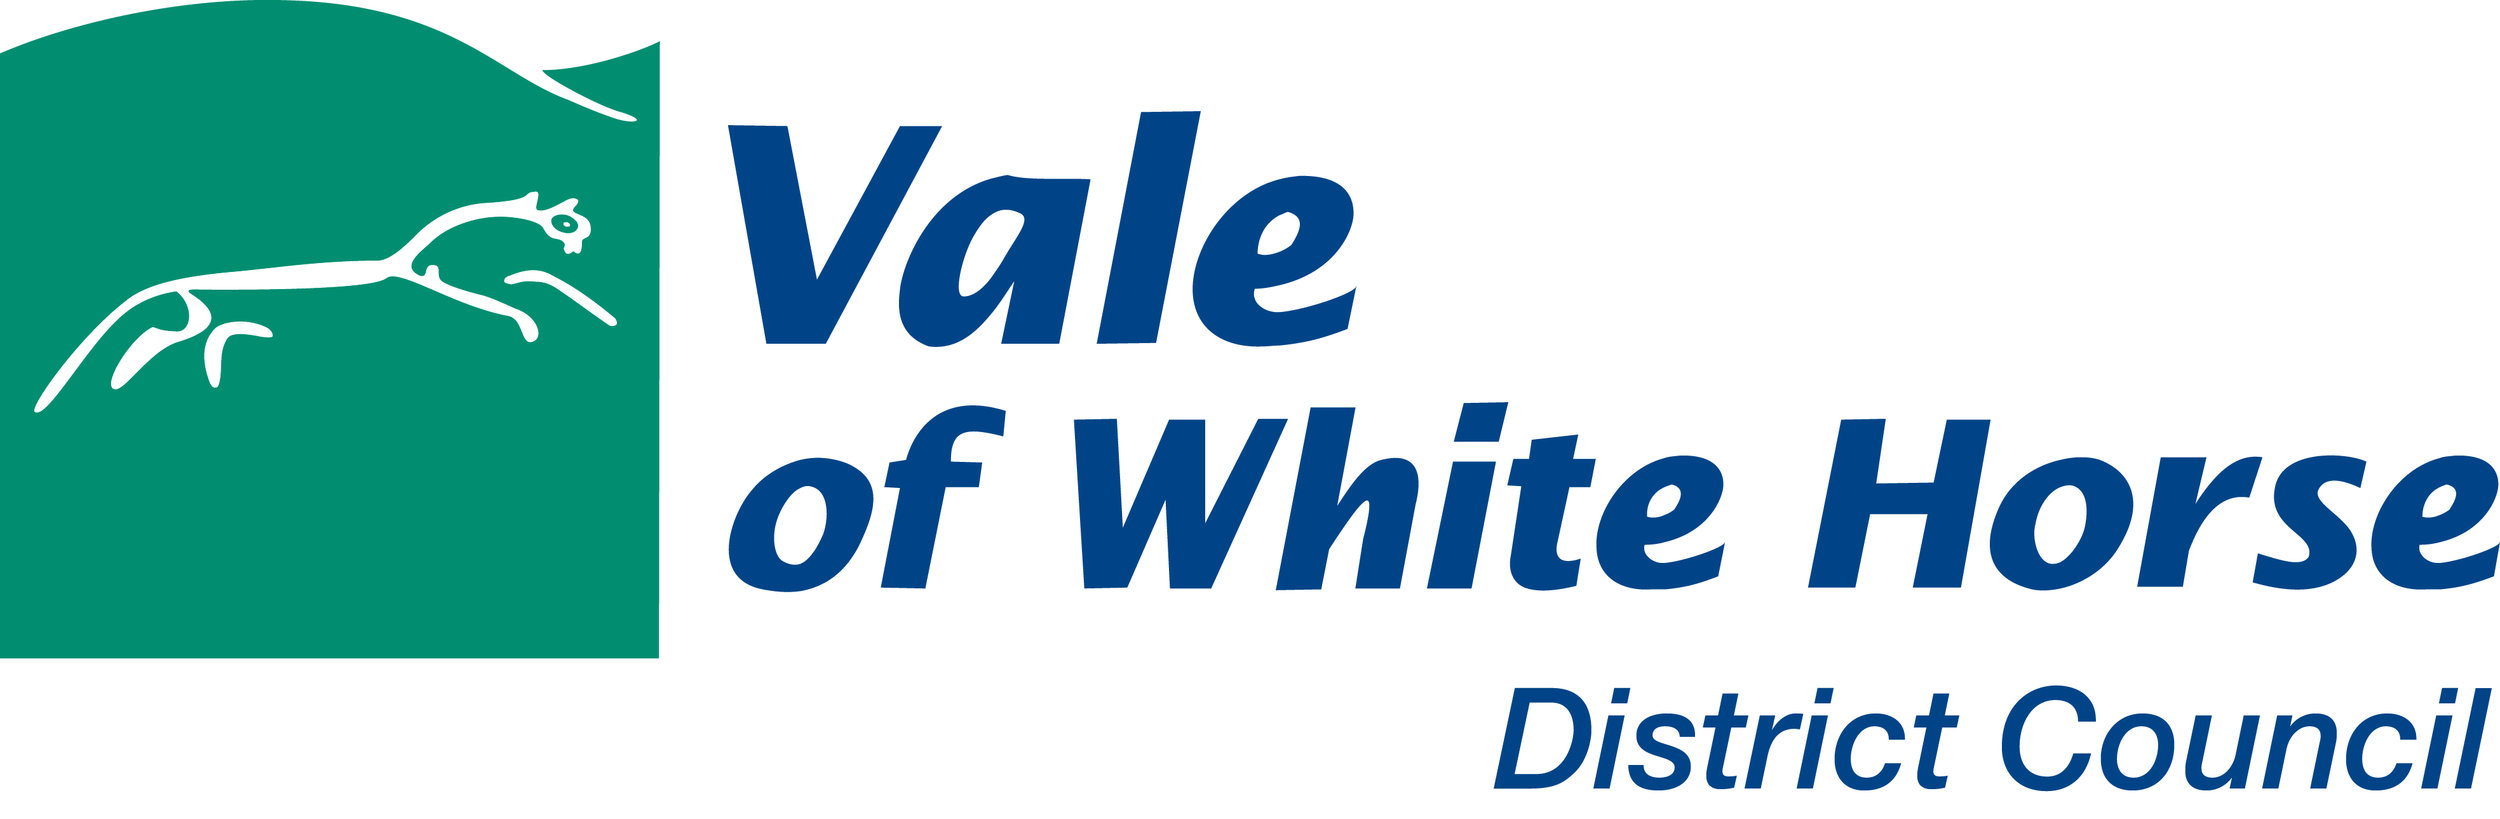 Vale Colour Logo.jpg